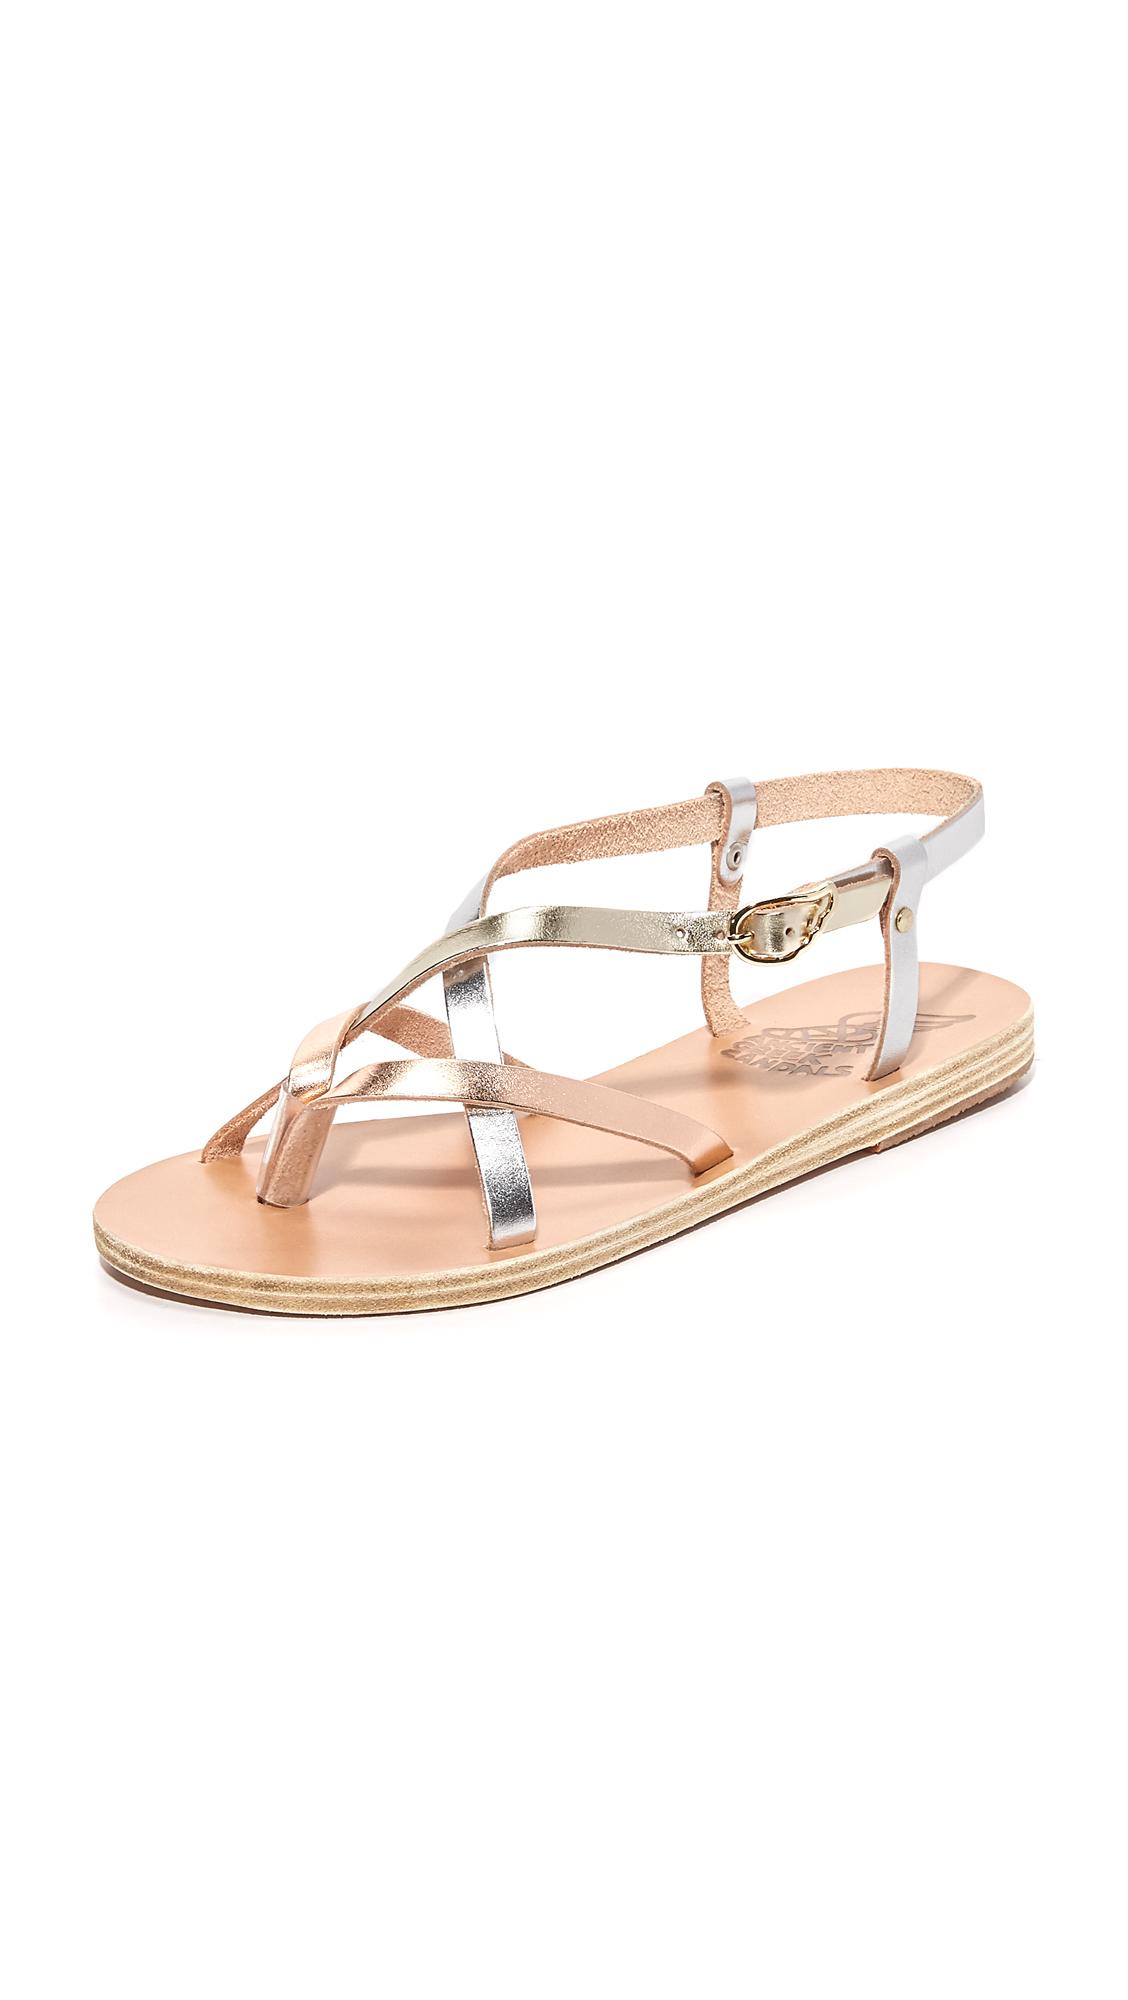 Ancient Greek Sandals Semele Sandals - Pink Metal/Silver/Platinum at Shopbop